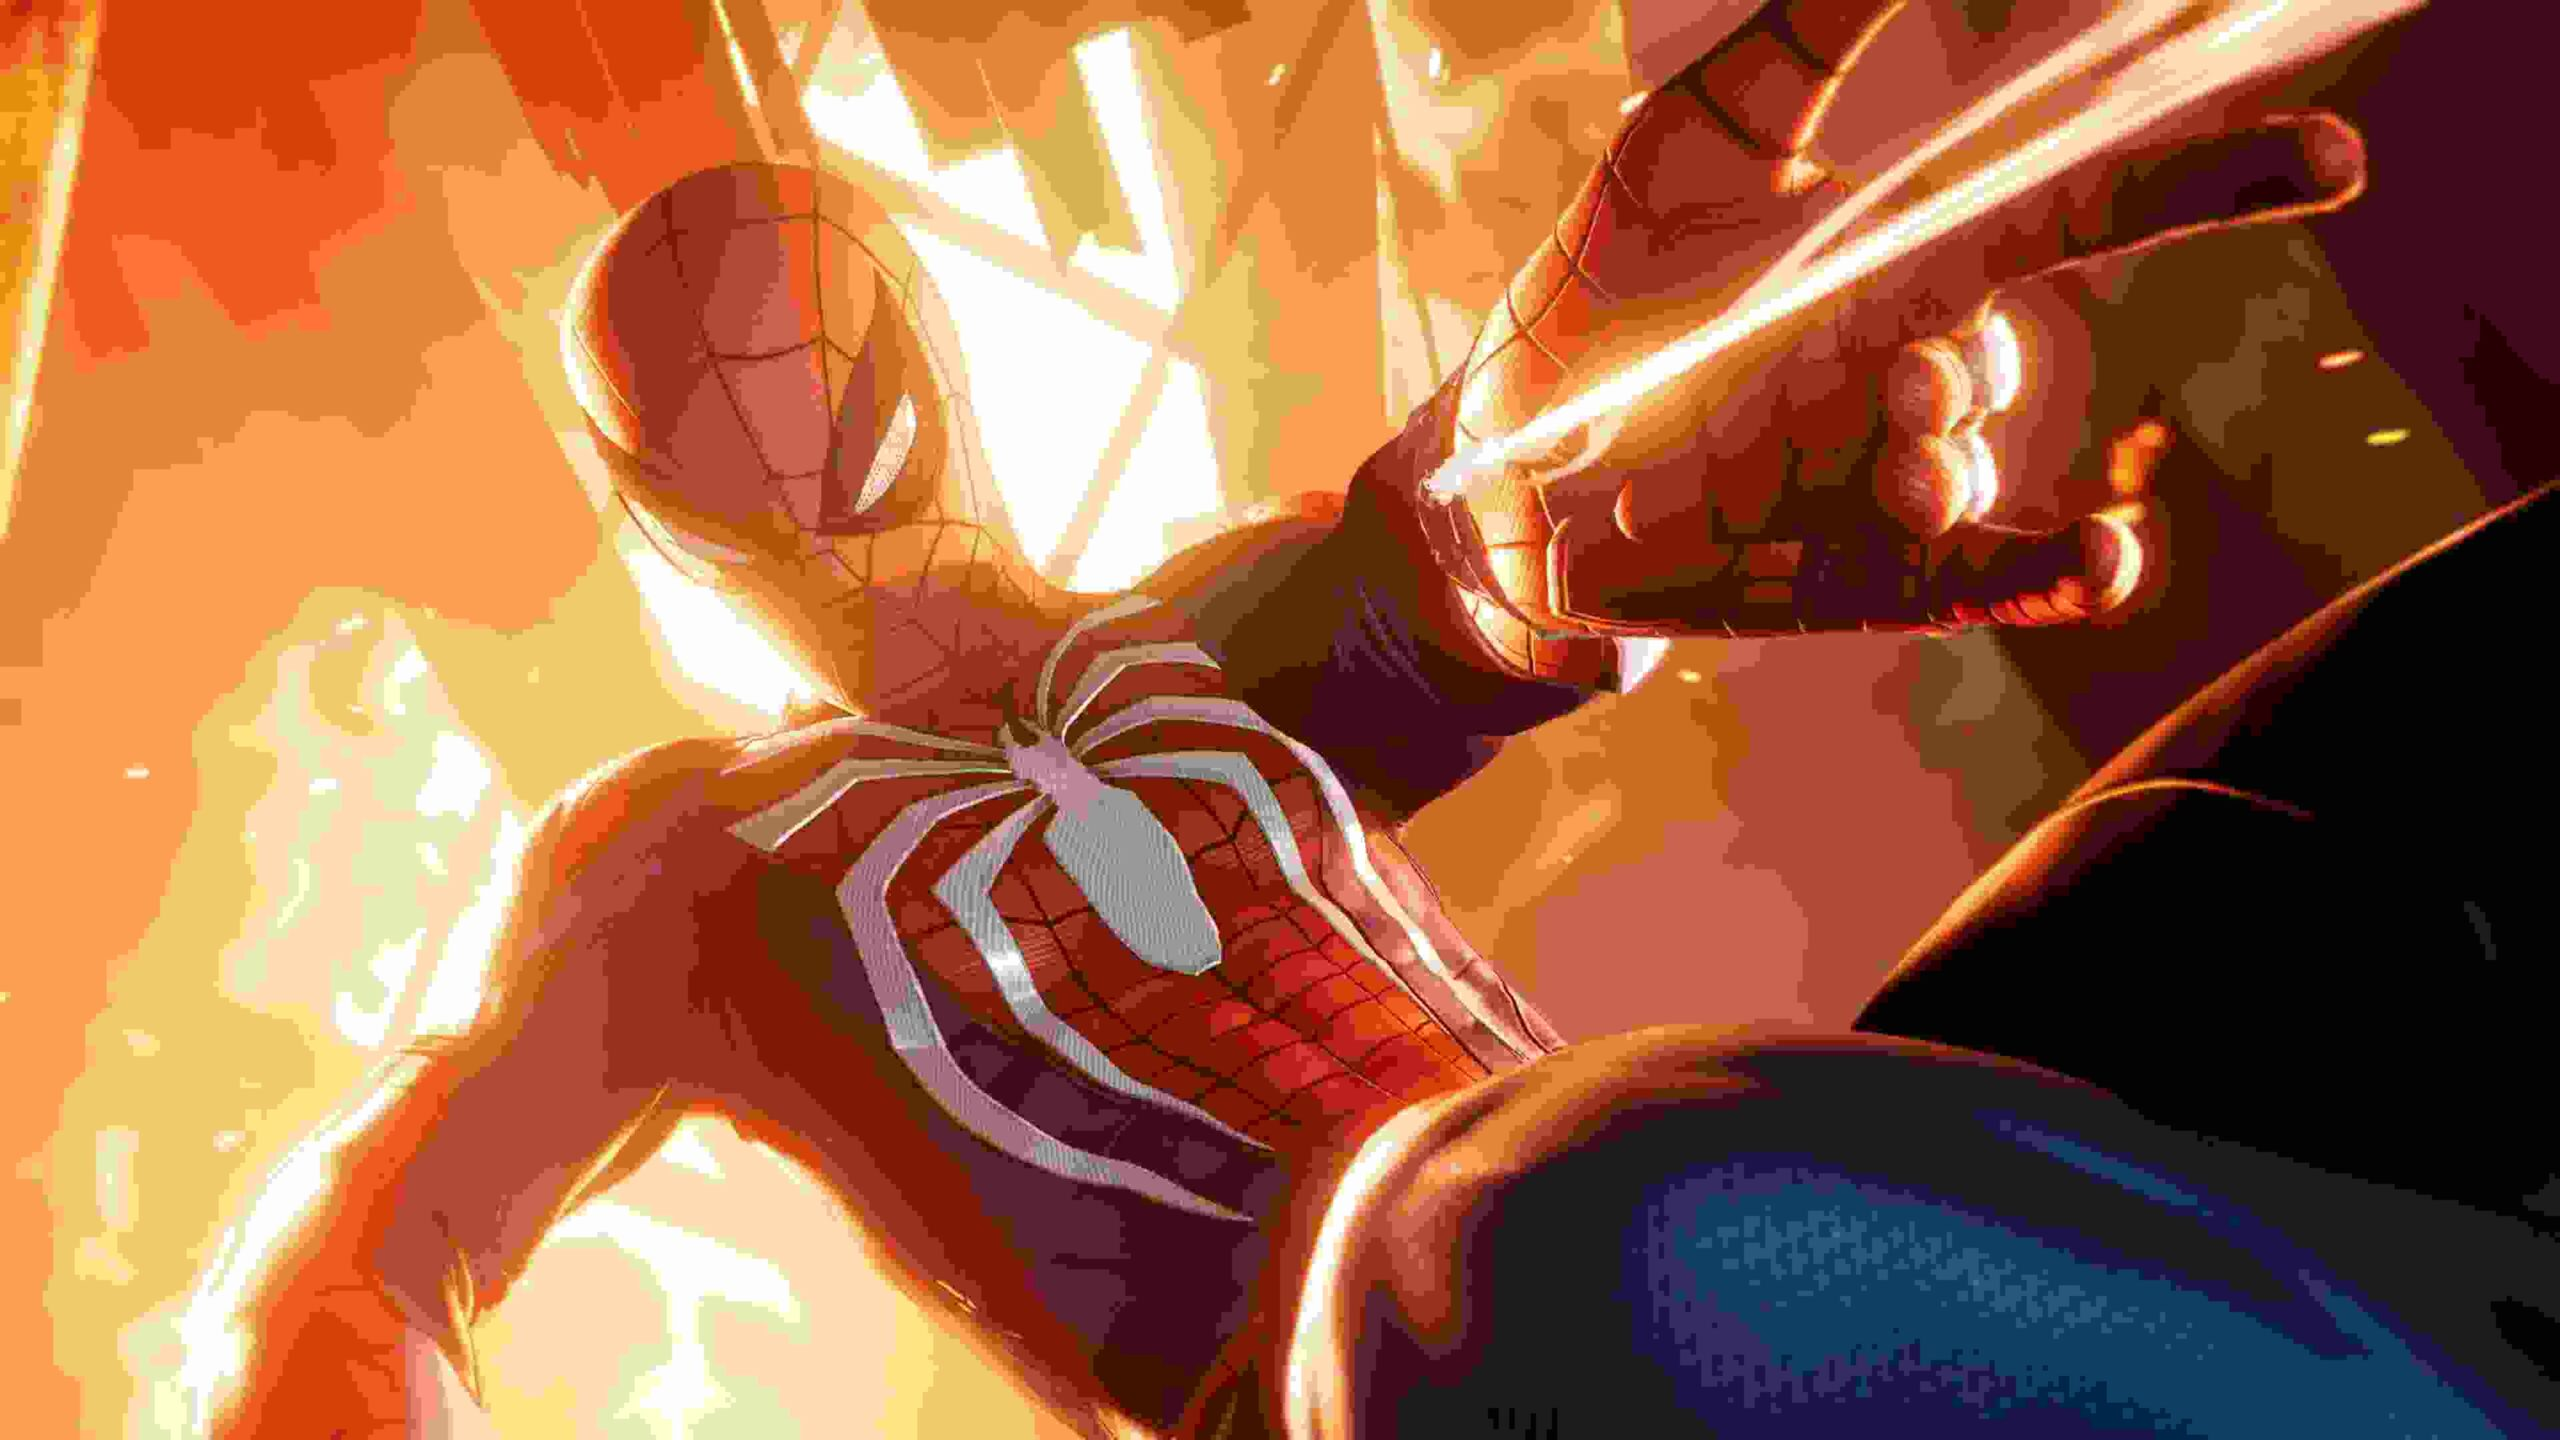 Spiderman Full Game Ps4 - HD Wallpaper